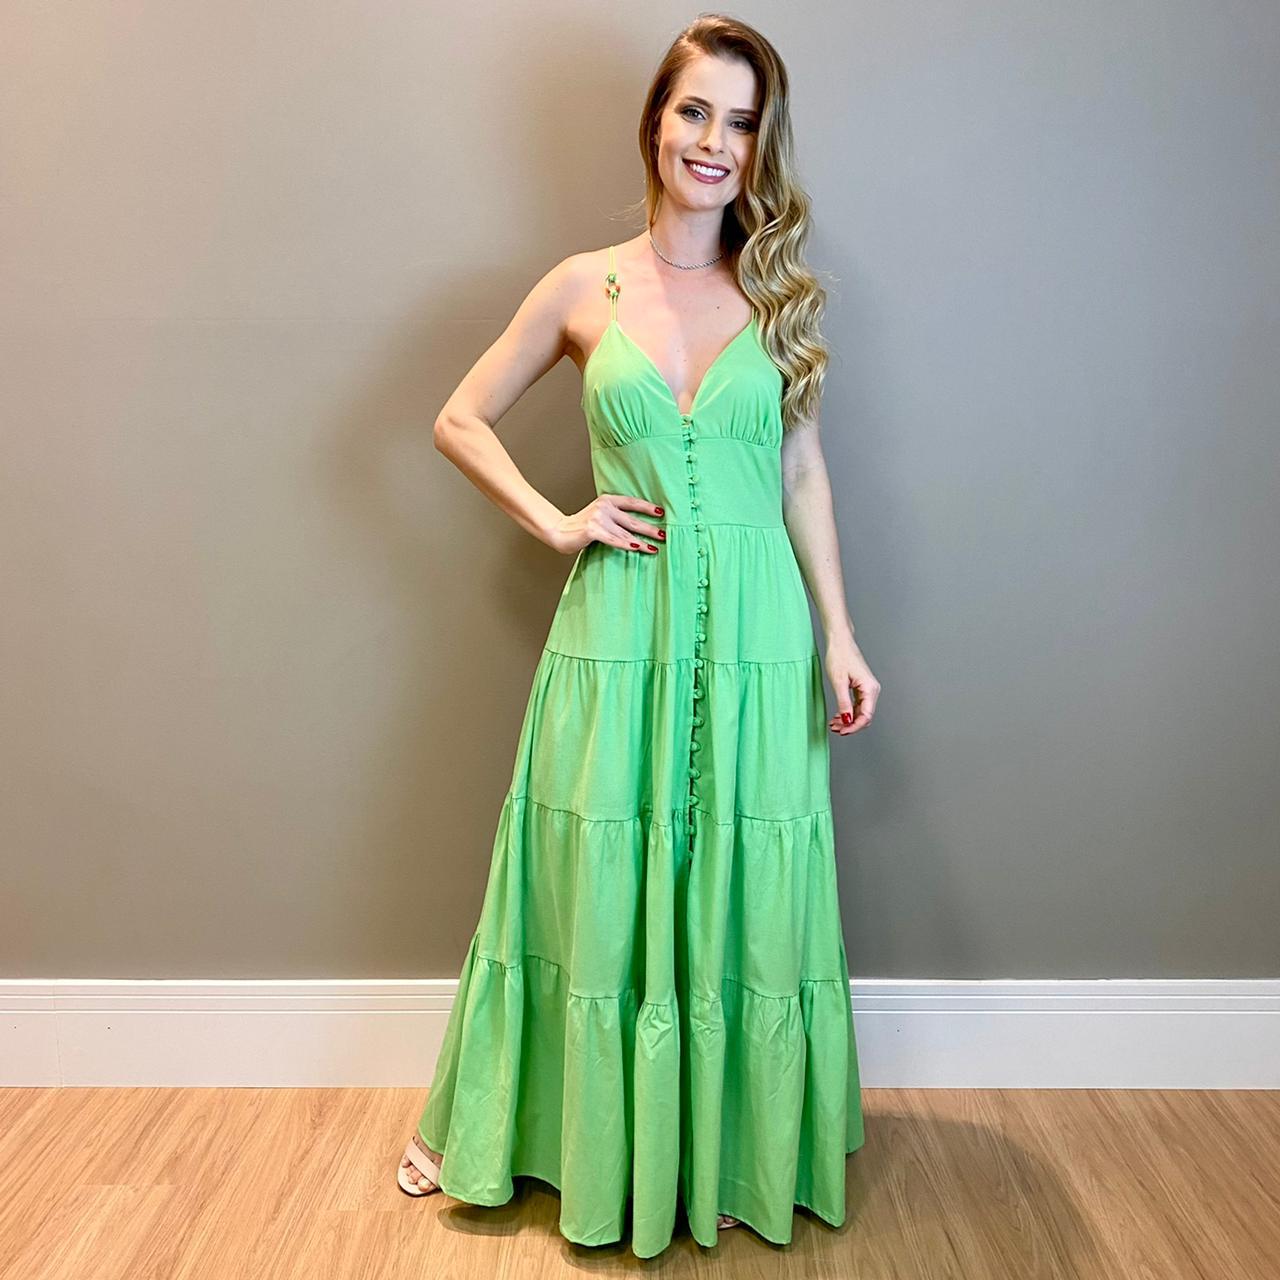 Vestido detalhe na alça Verde -